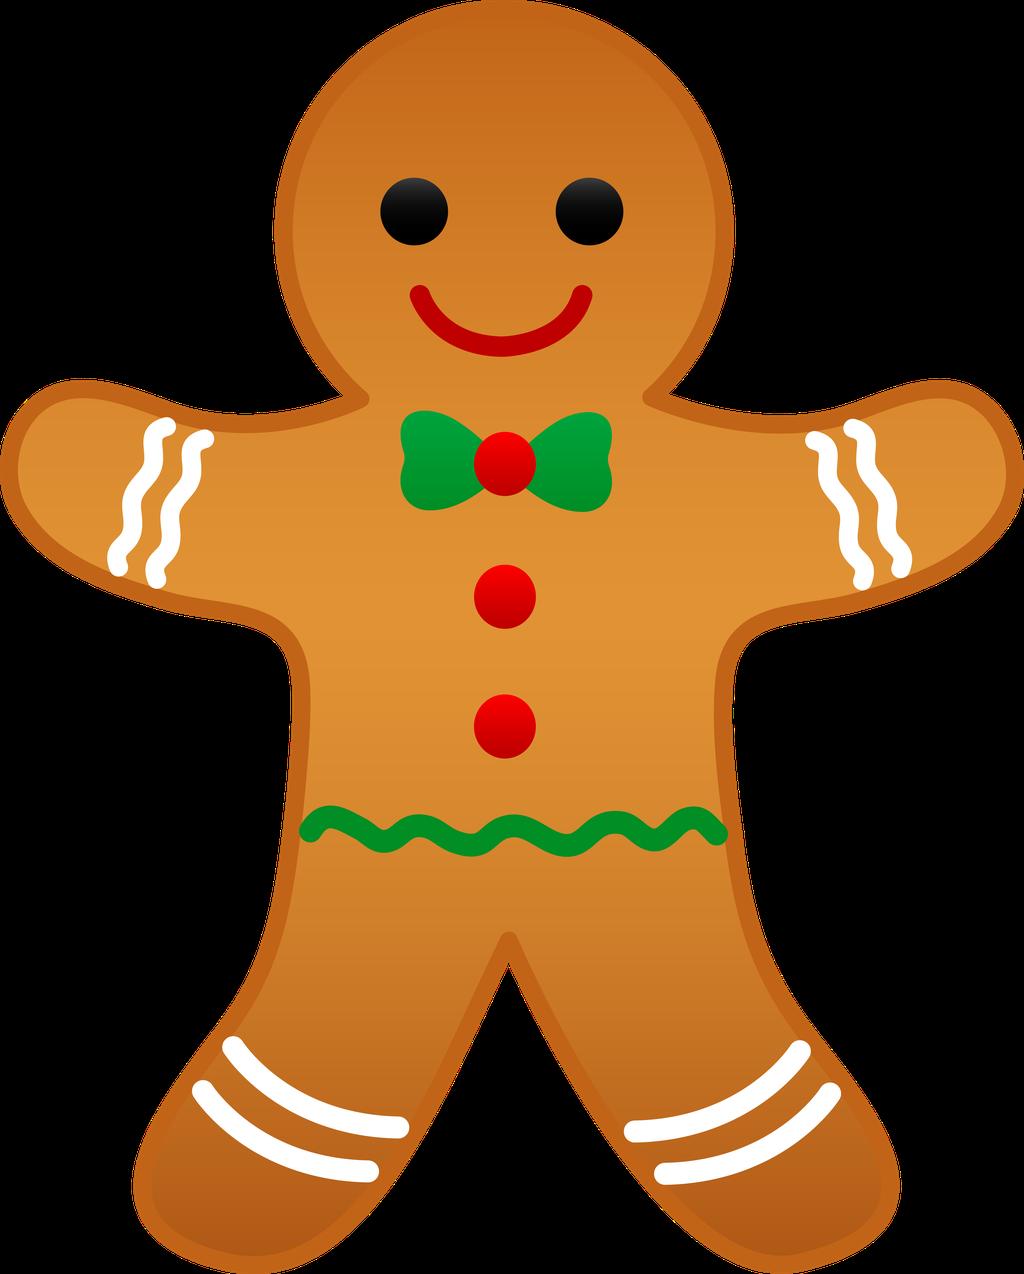 Sweet Gingerbread Man, Gingerbread House, StarFall Ginger...